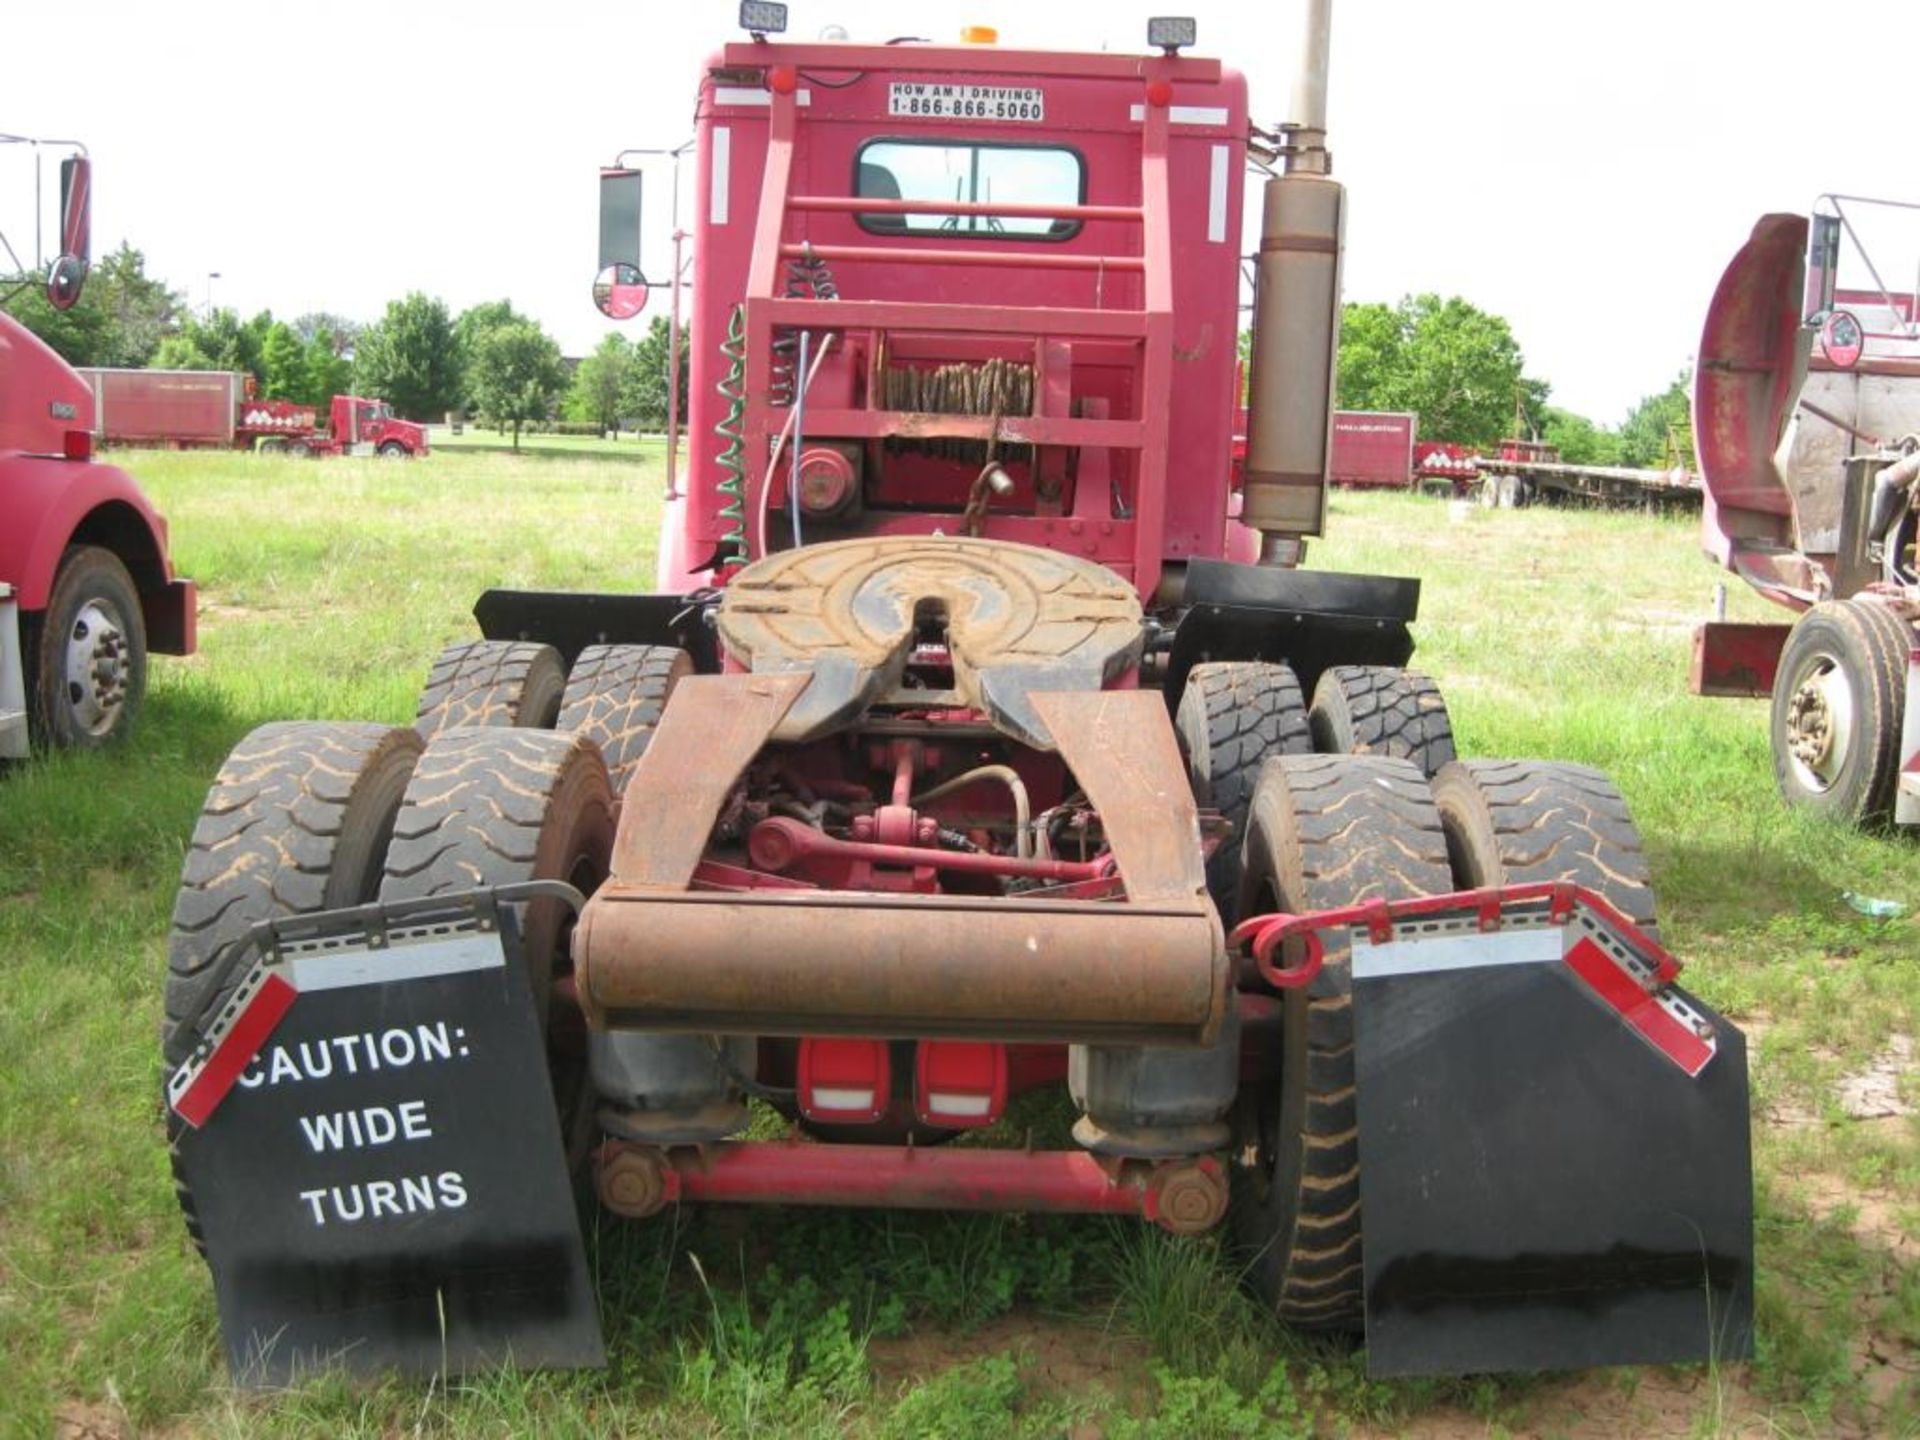 Kenworth Winch Truck - Image 6 of 23